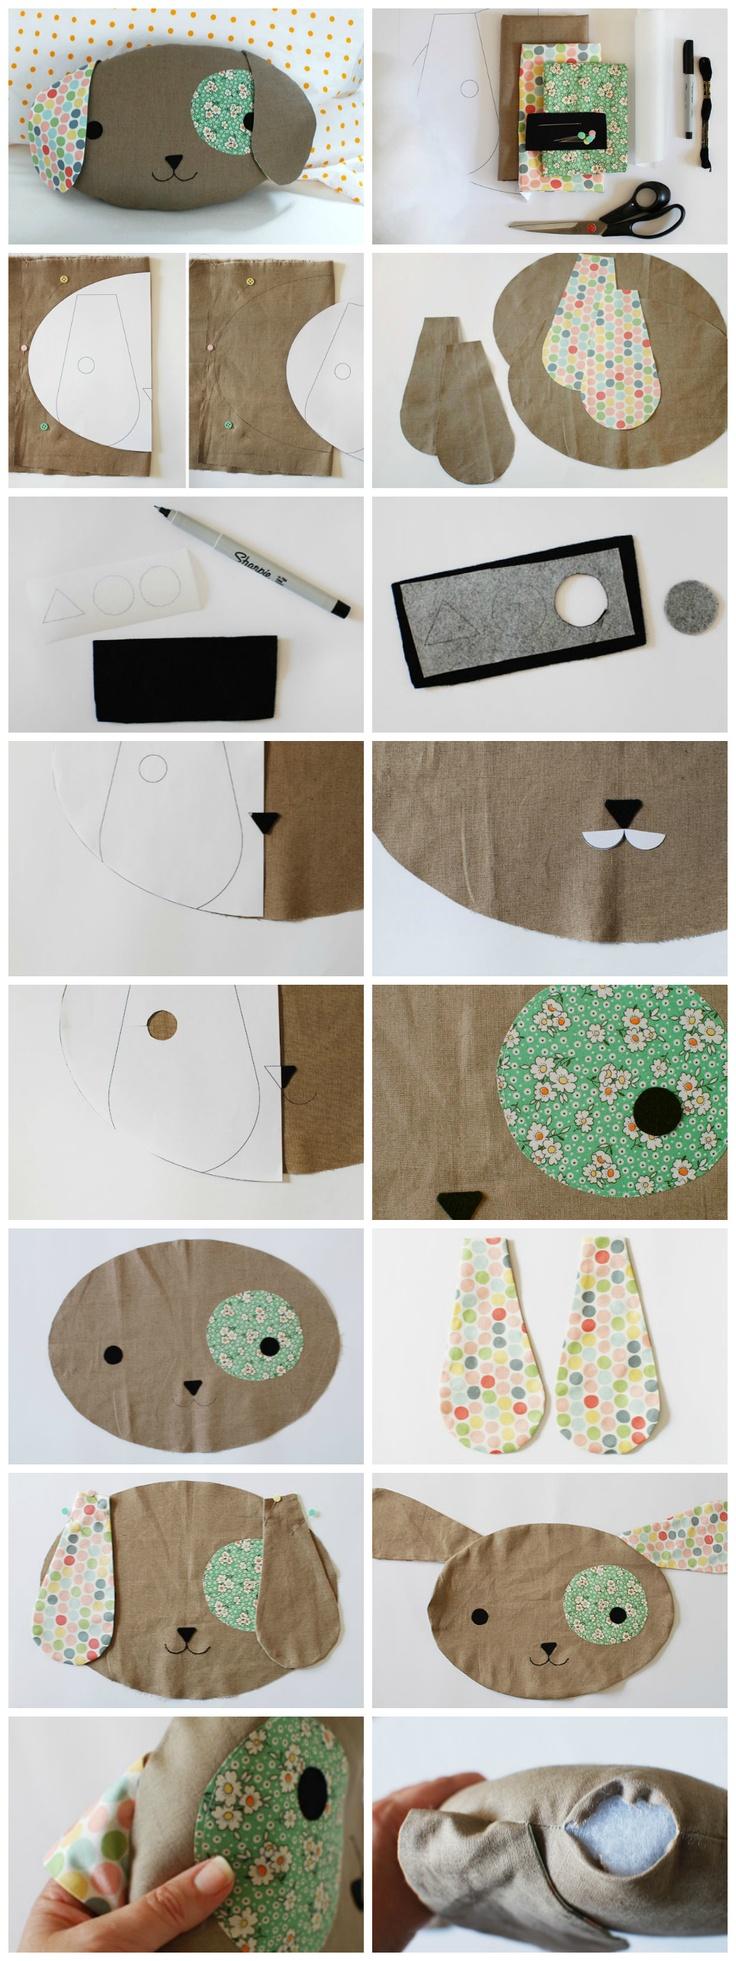 10 Homemade Softie Tutorials - Pretty Designs